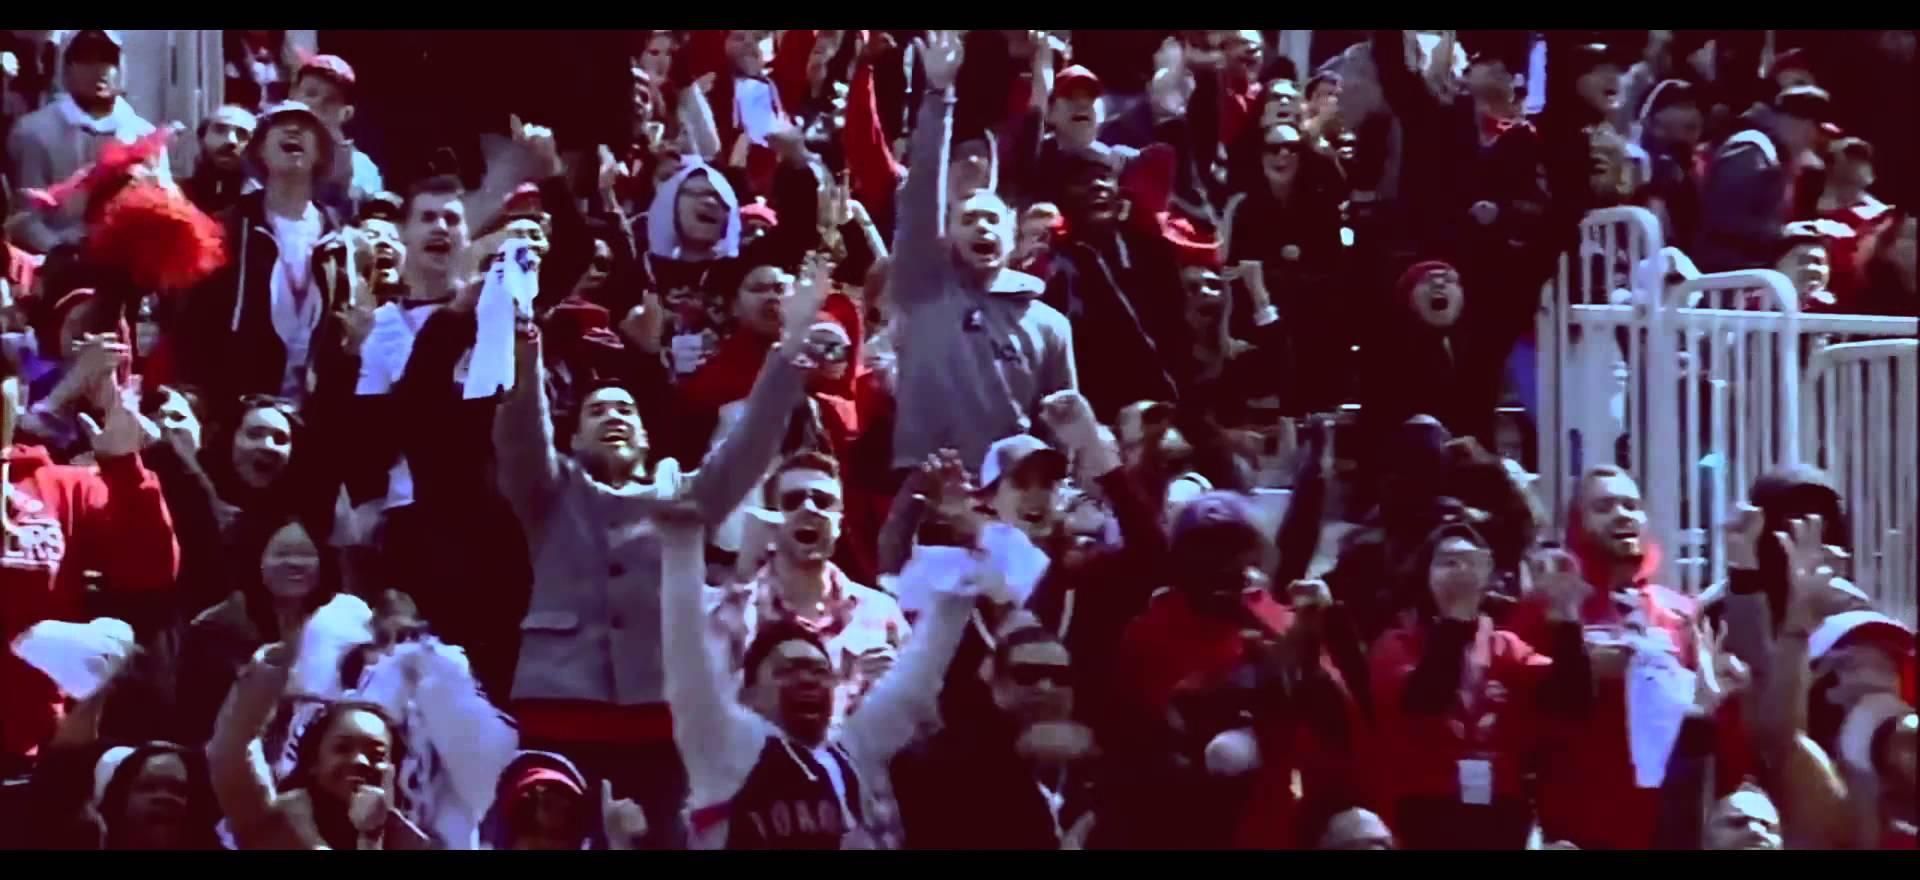 Peter Jackson – Welcome To Jurassic Park [Toronto Raptors Playoff Tribute]